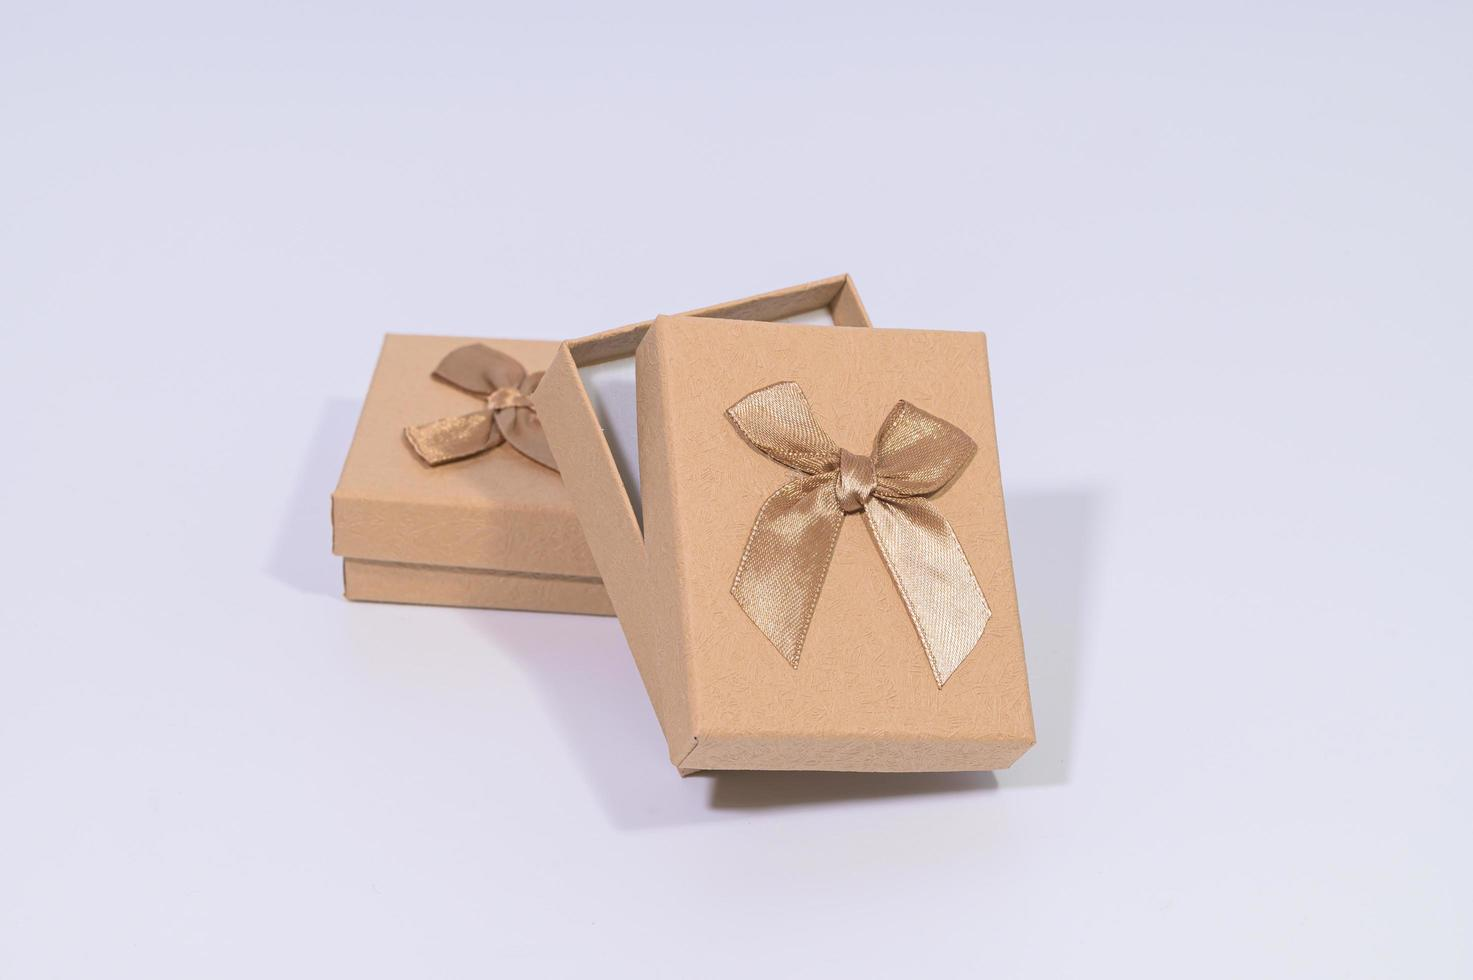 bruine geschenkdozen op witte achtergrond foto